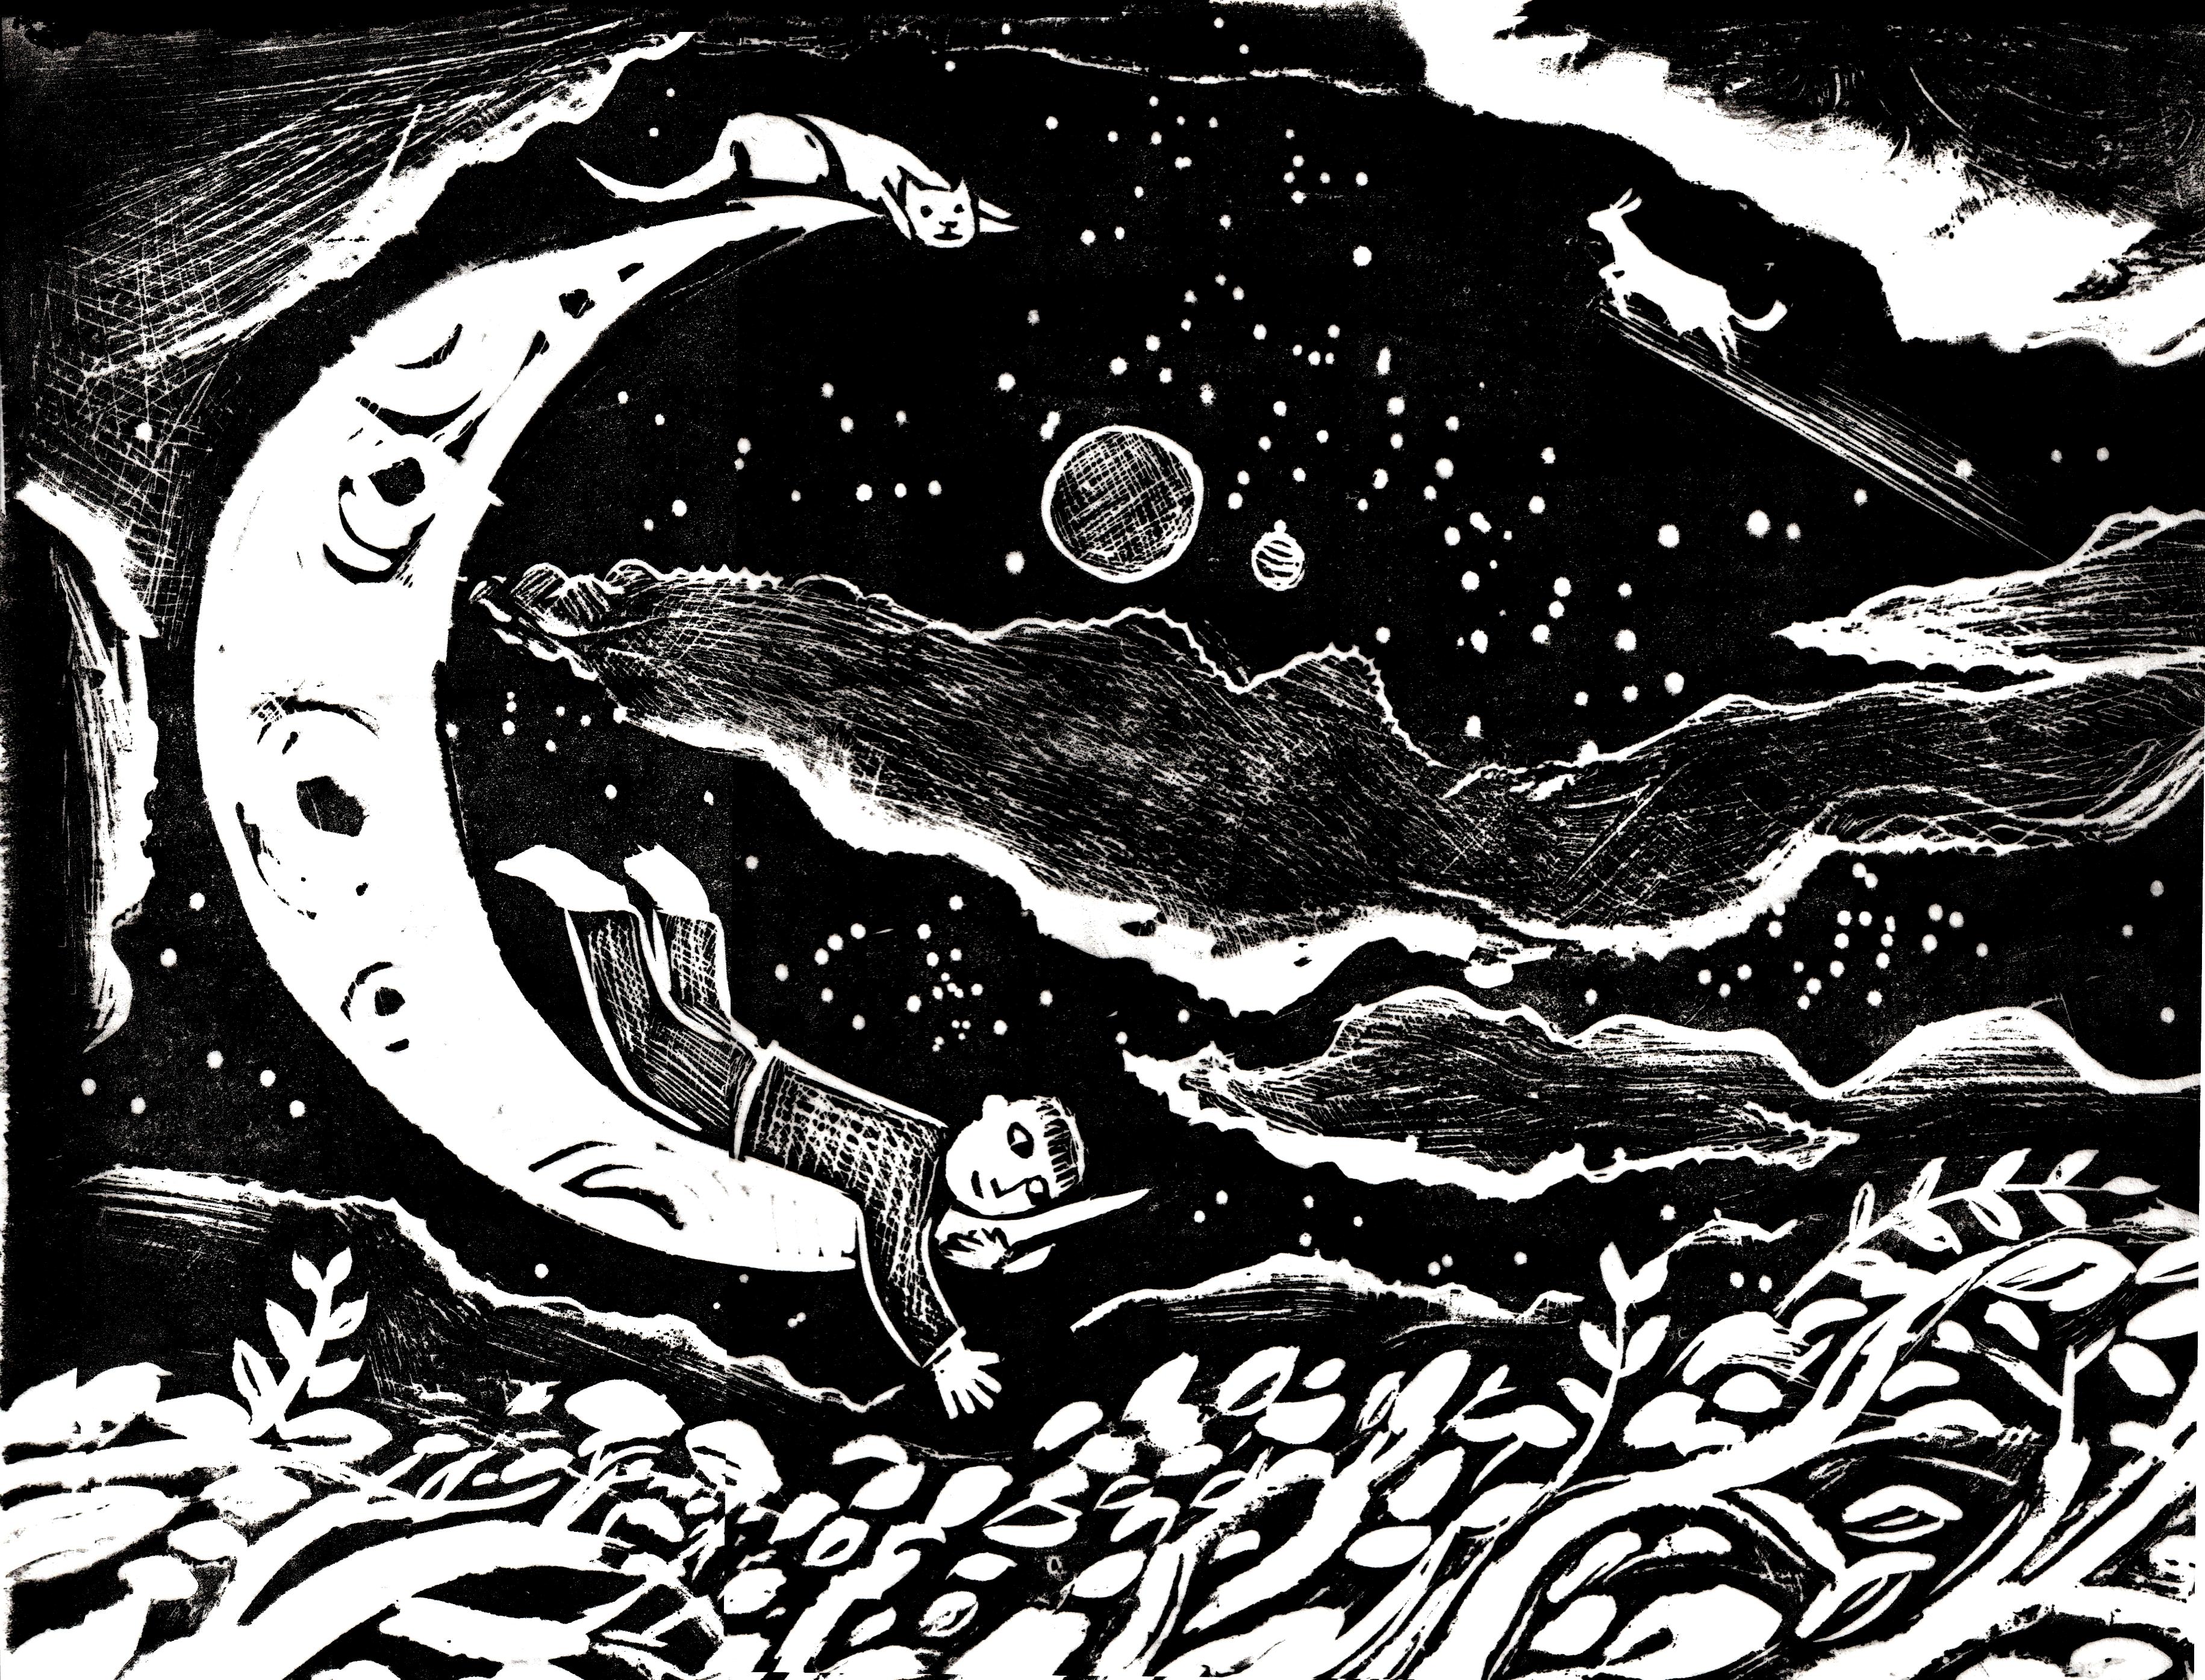 THE Crescent moon PRINT